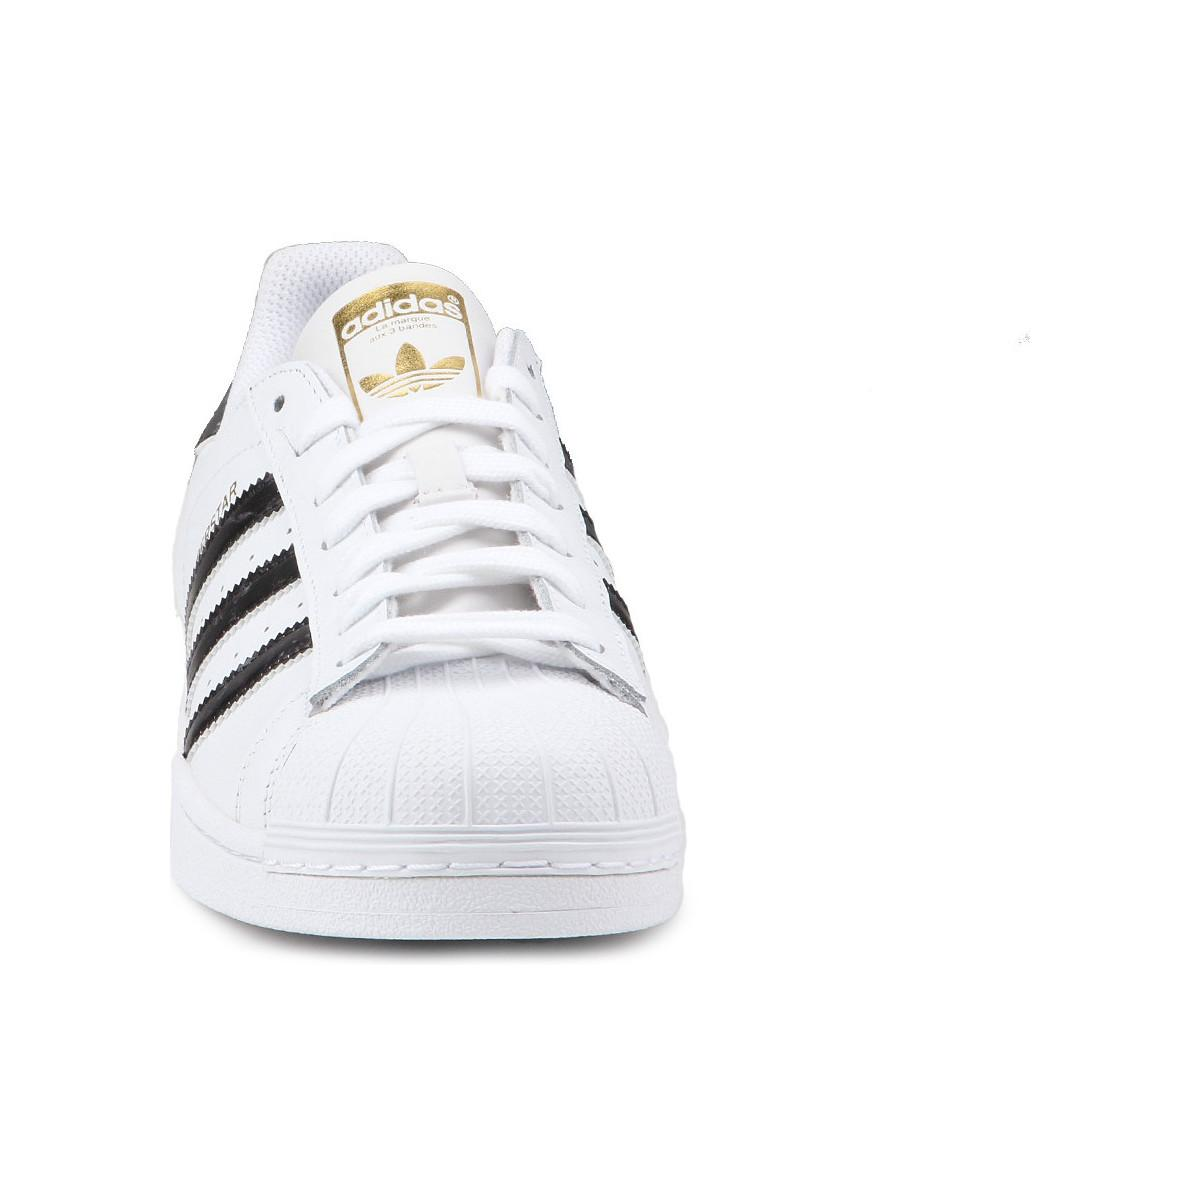 Lifestyle Shoes Superstar D96799